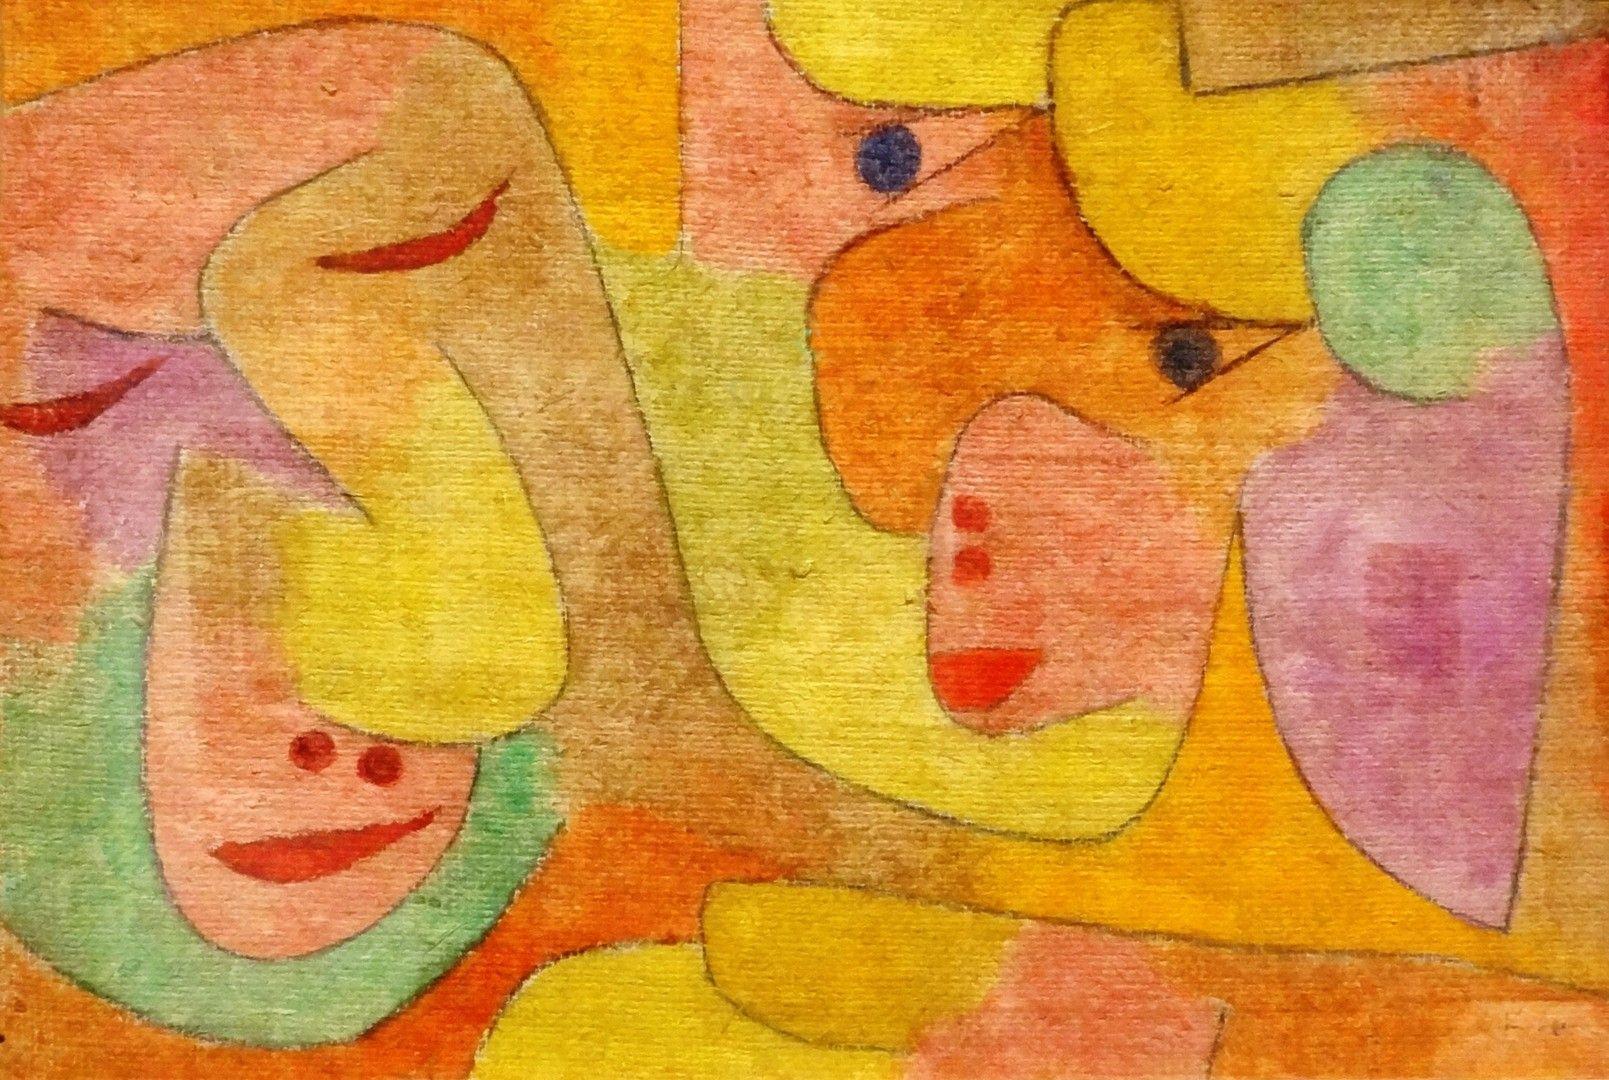 Paul Klee | Old Married Couple | 1931 | Tempera on burlap | 33.02 X 47.62 cm (13 X 18.75 in)